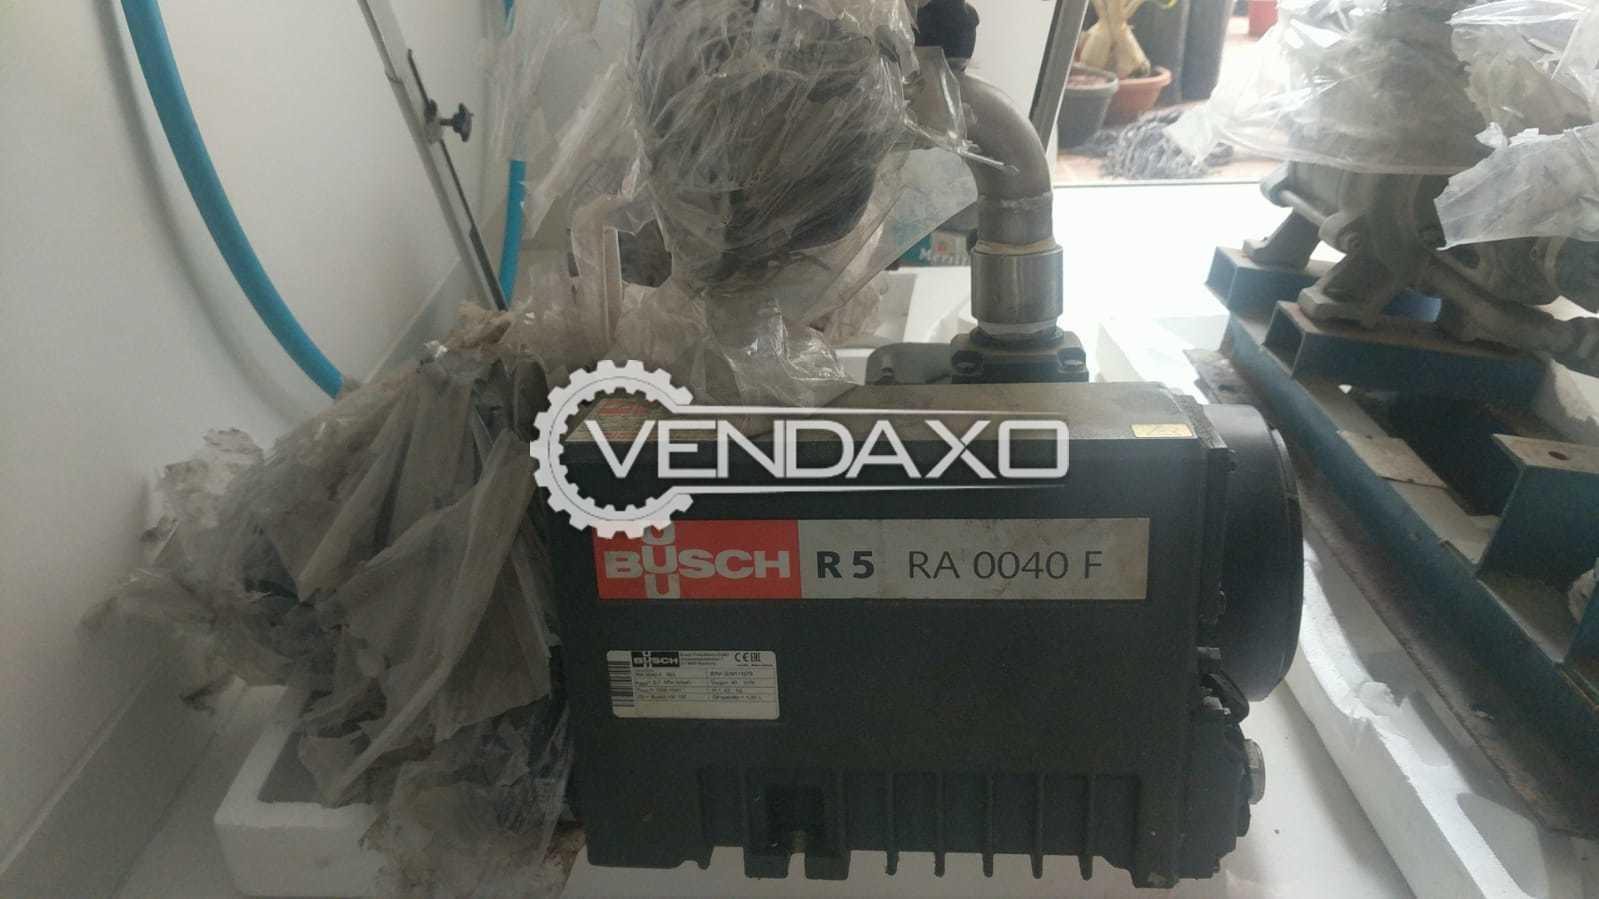 Busch RA0040 Vacuum Pump - 2019 Model